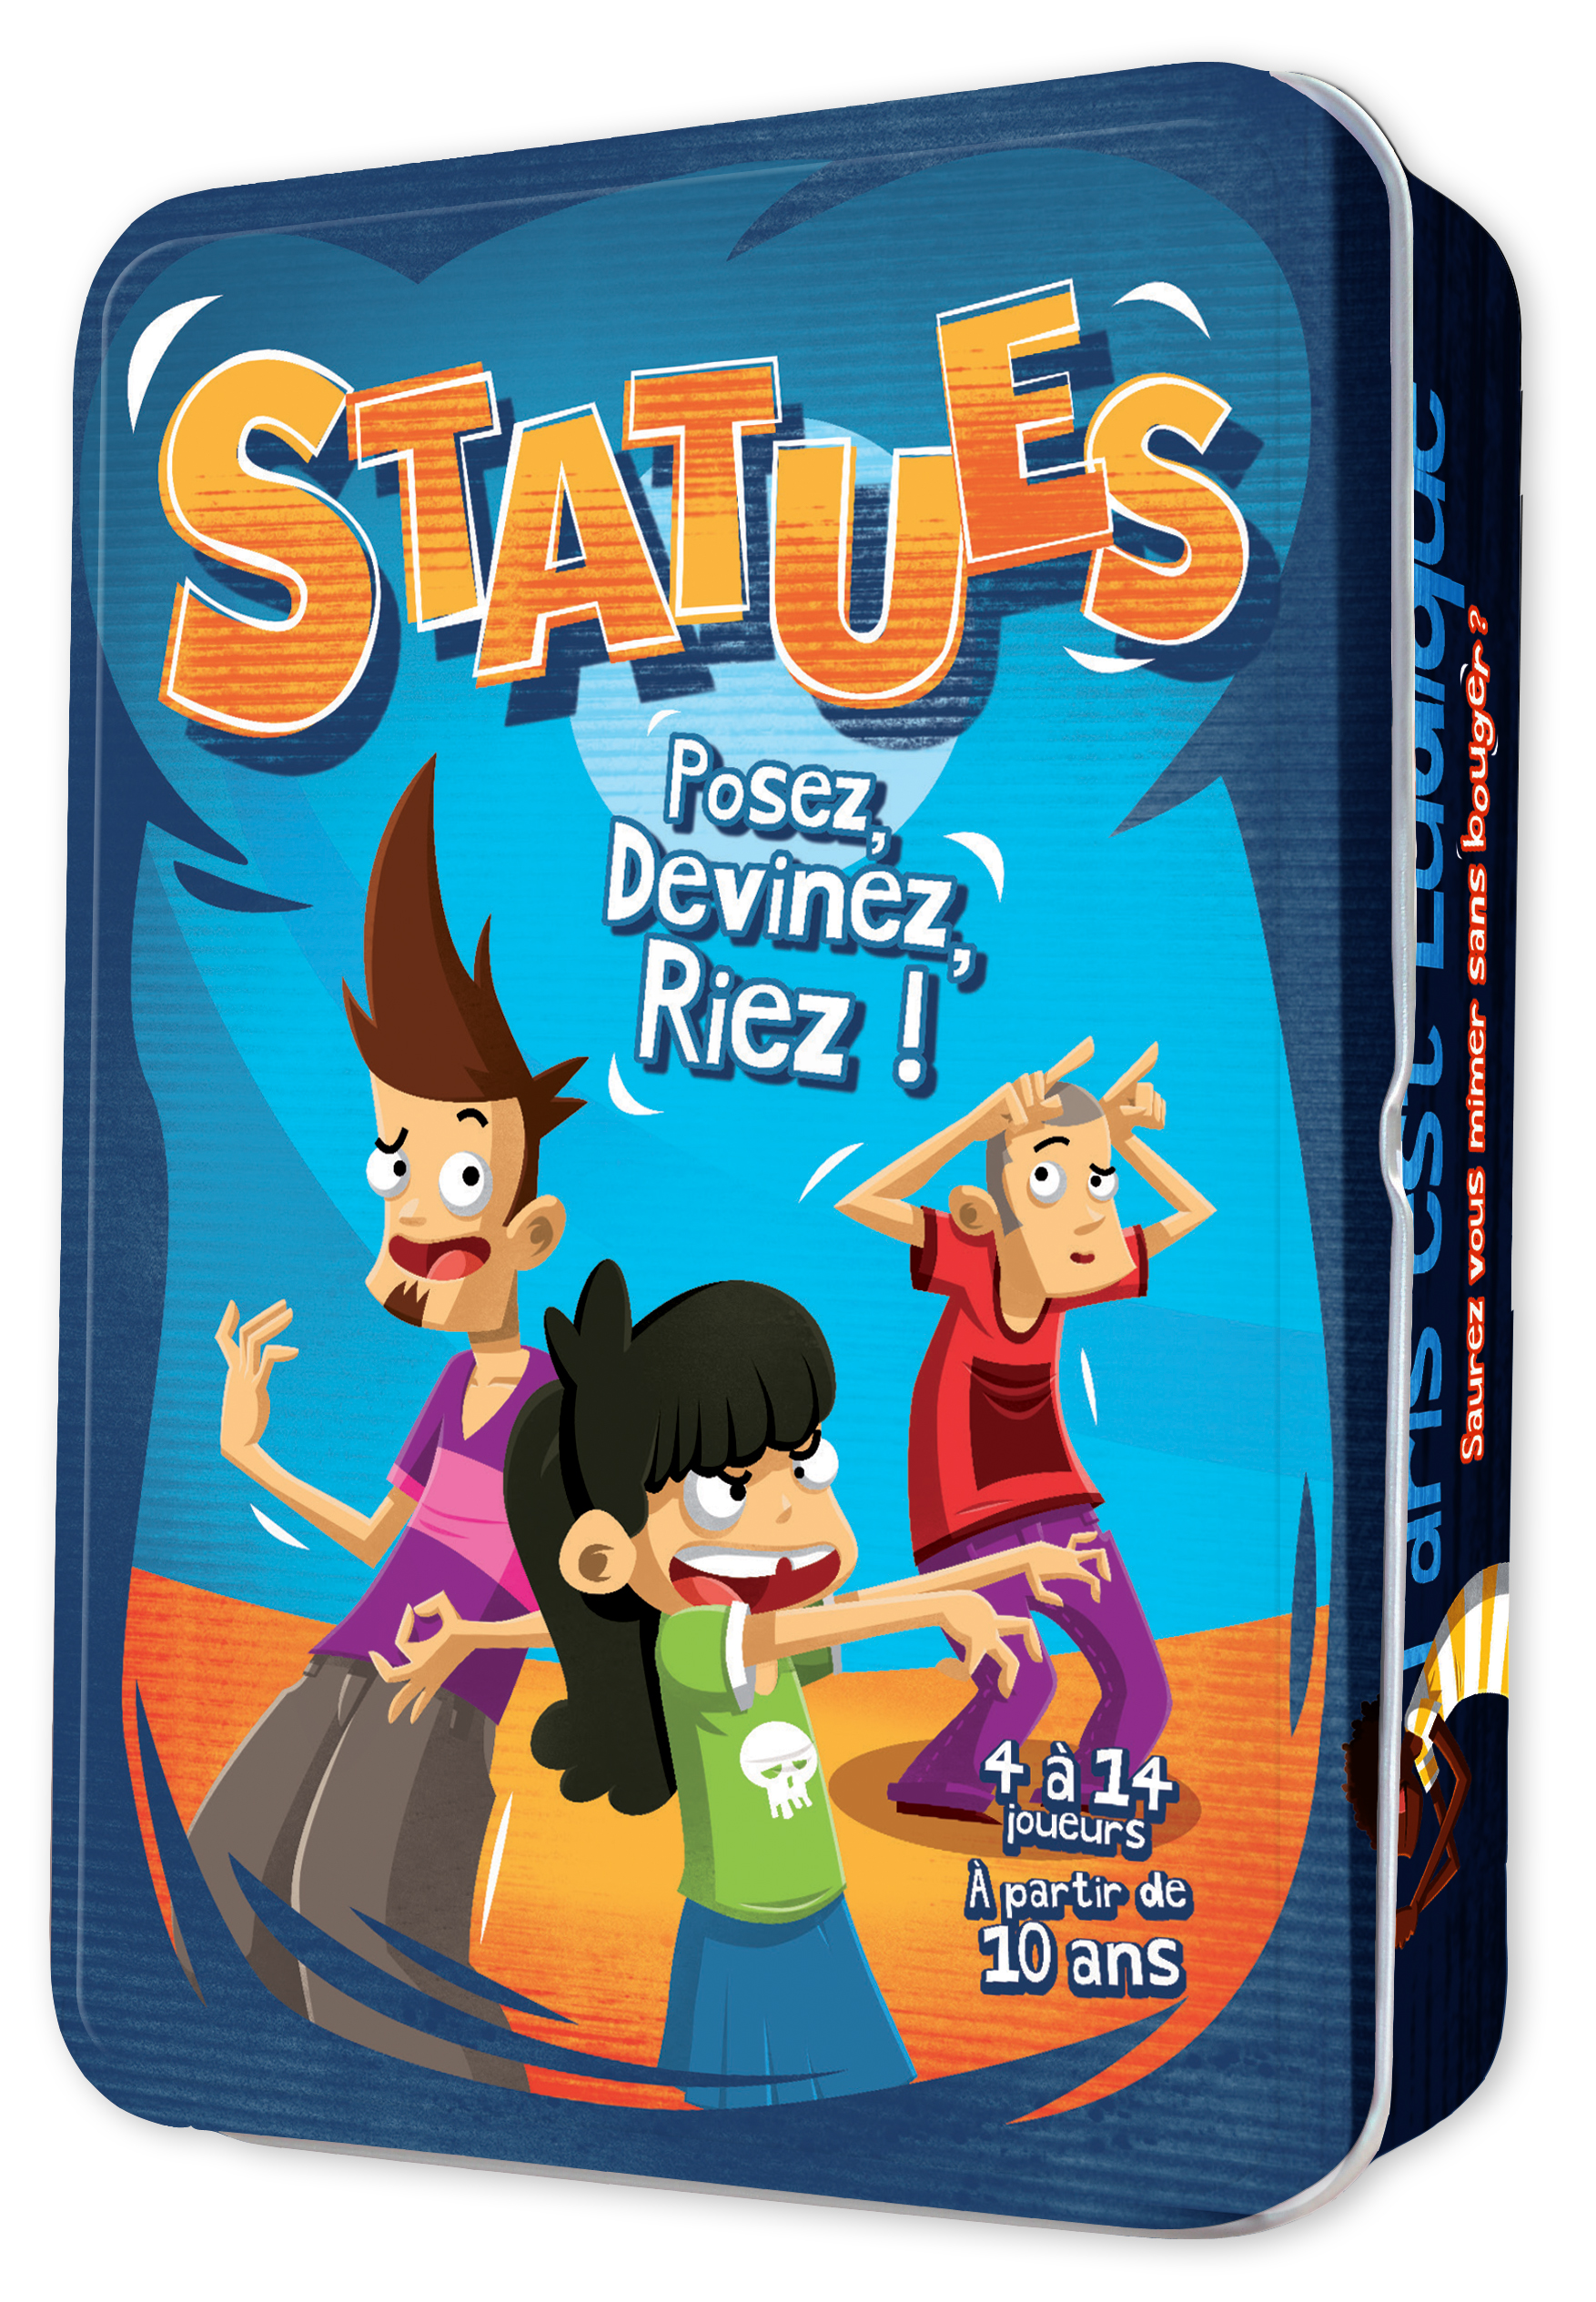 STAT01-Statues-3D